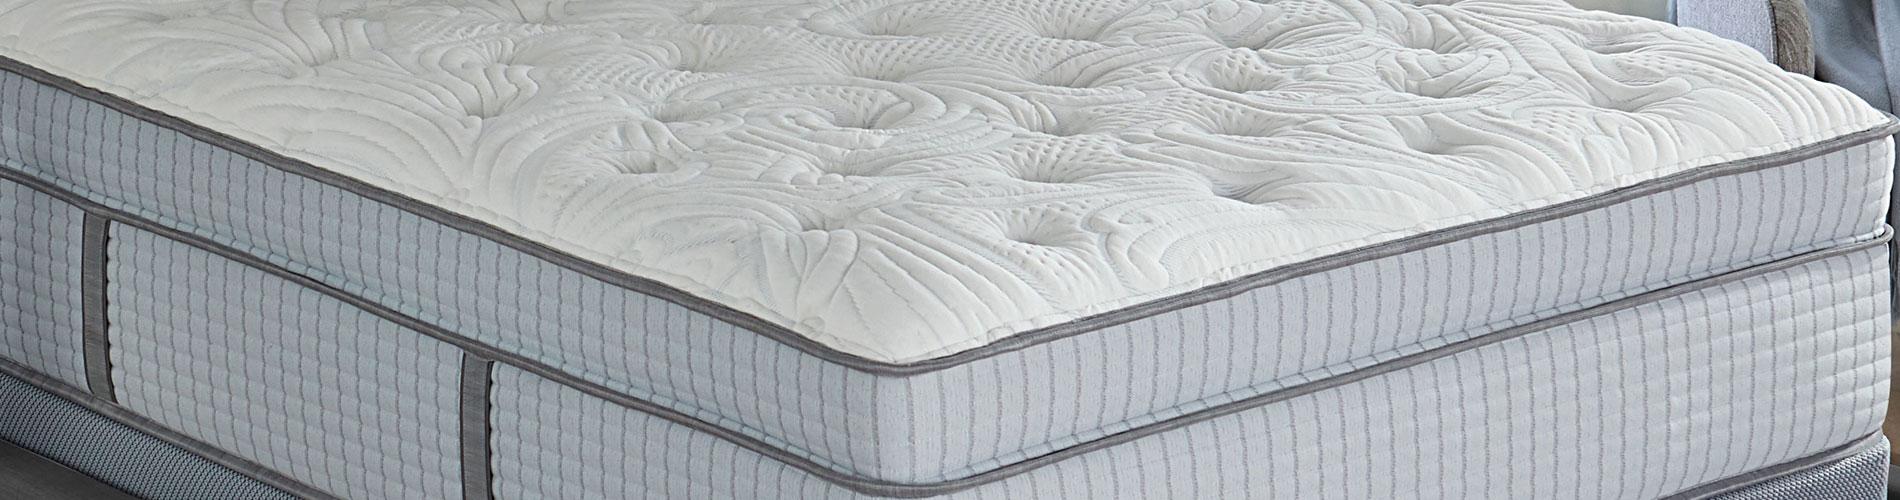 scott living microcoil mattresses restonic